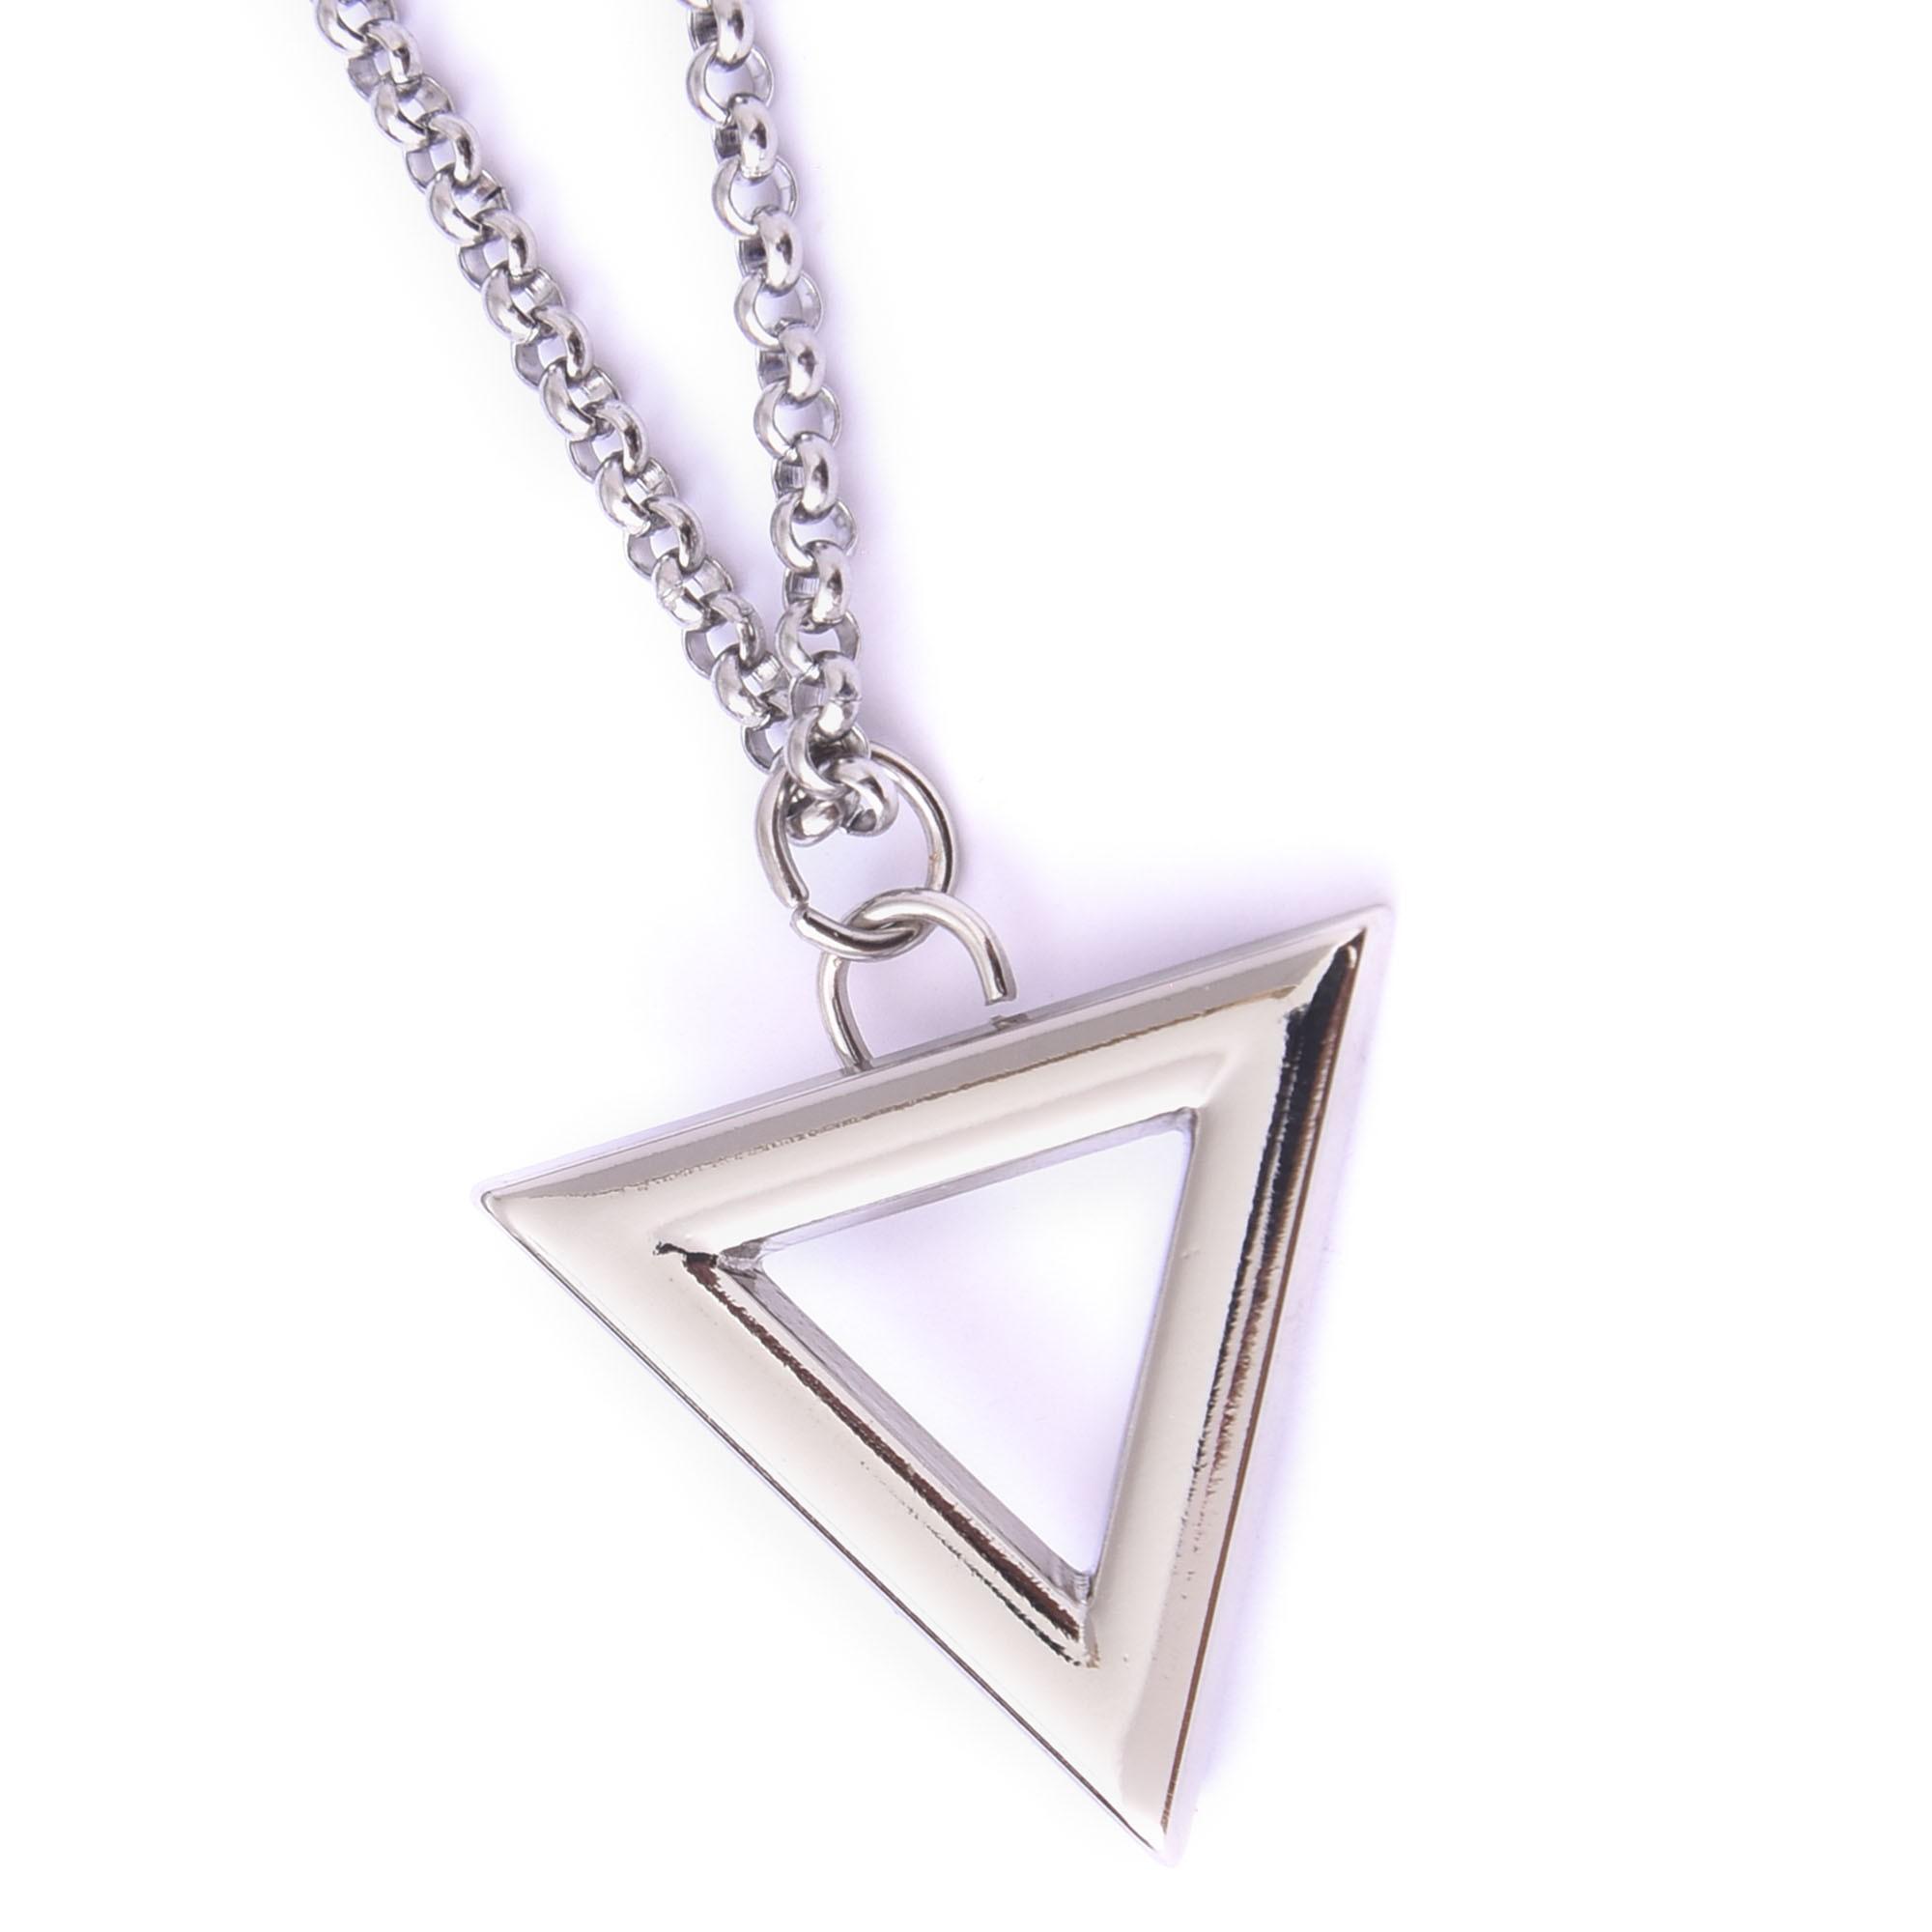 Corrente Aço Inoxidável Triângulo Prata  - Style Empório